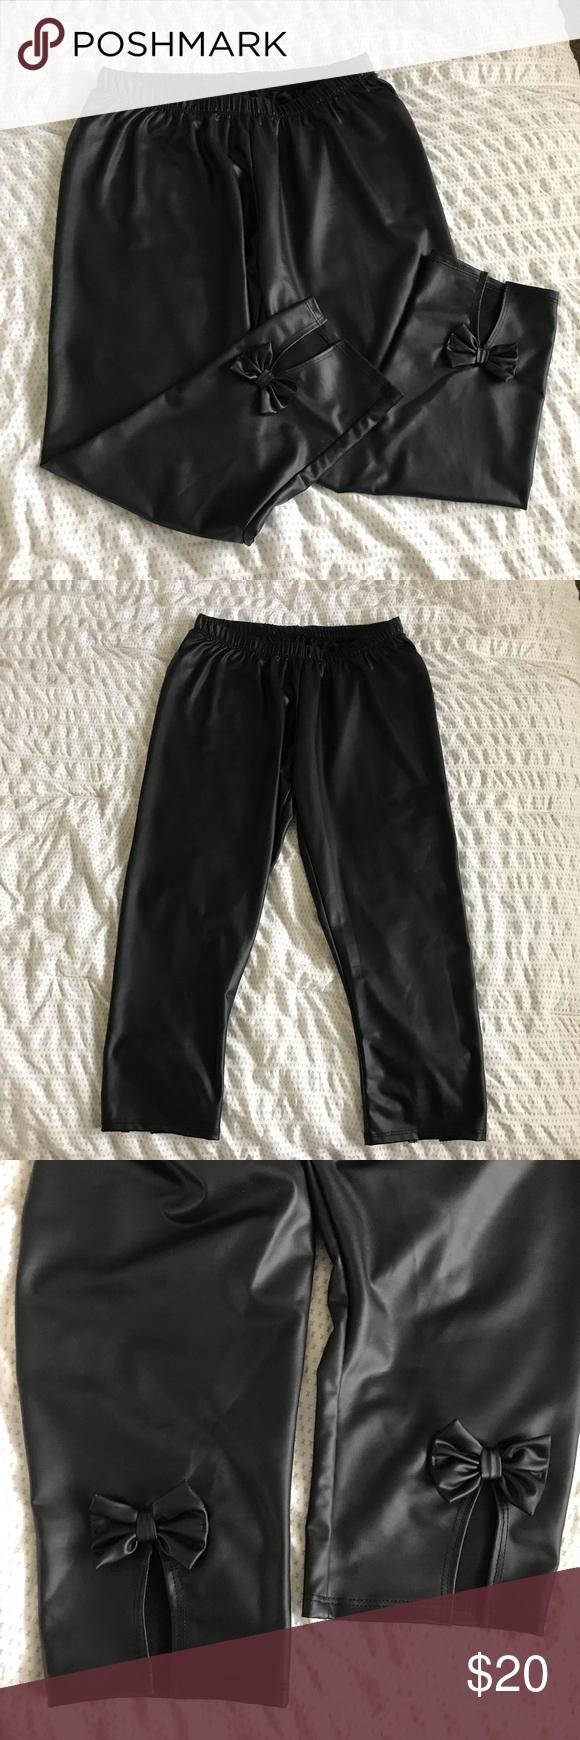 51f6c8bd628f6a Torrid Faux Leather Bow Back Leggings Faux Leather Bow Back Leggings Never  worn! torrid Pants Leggings